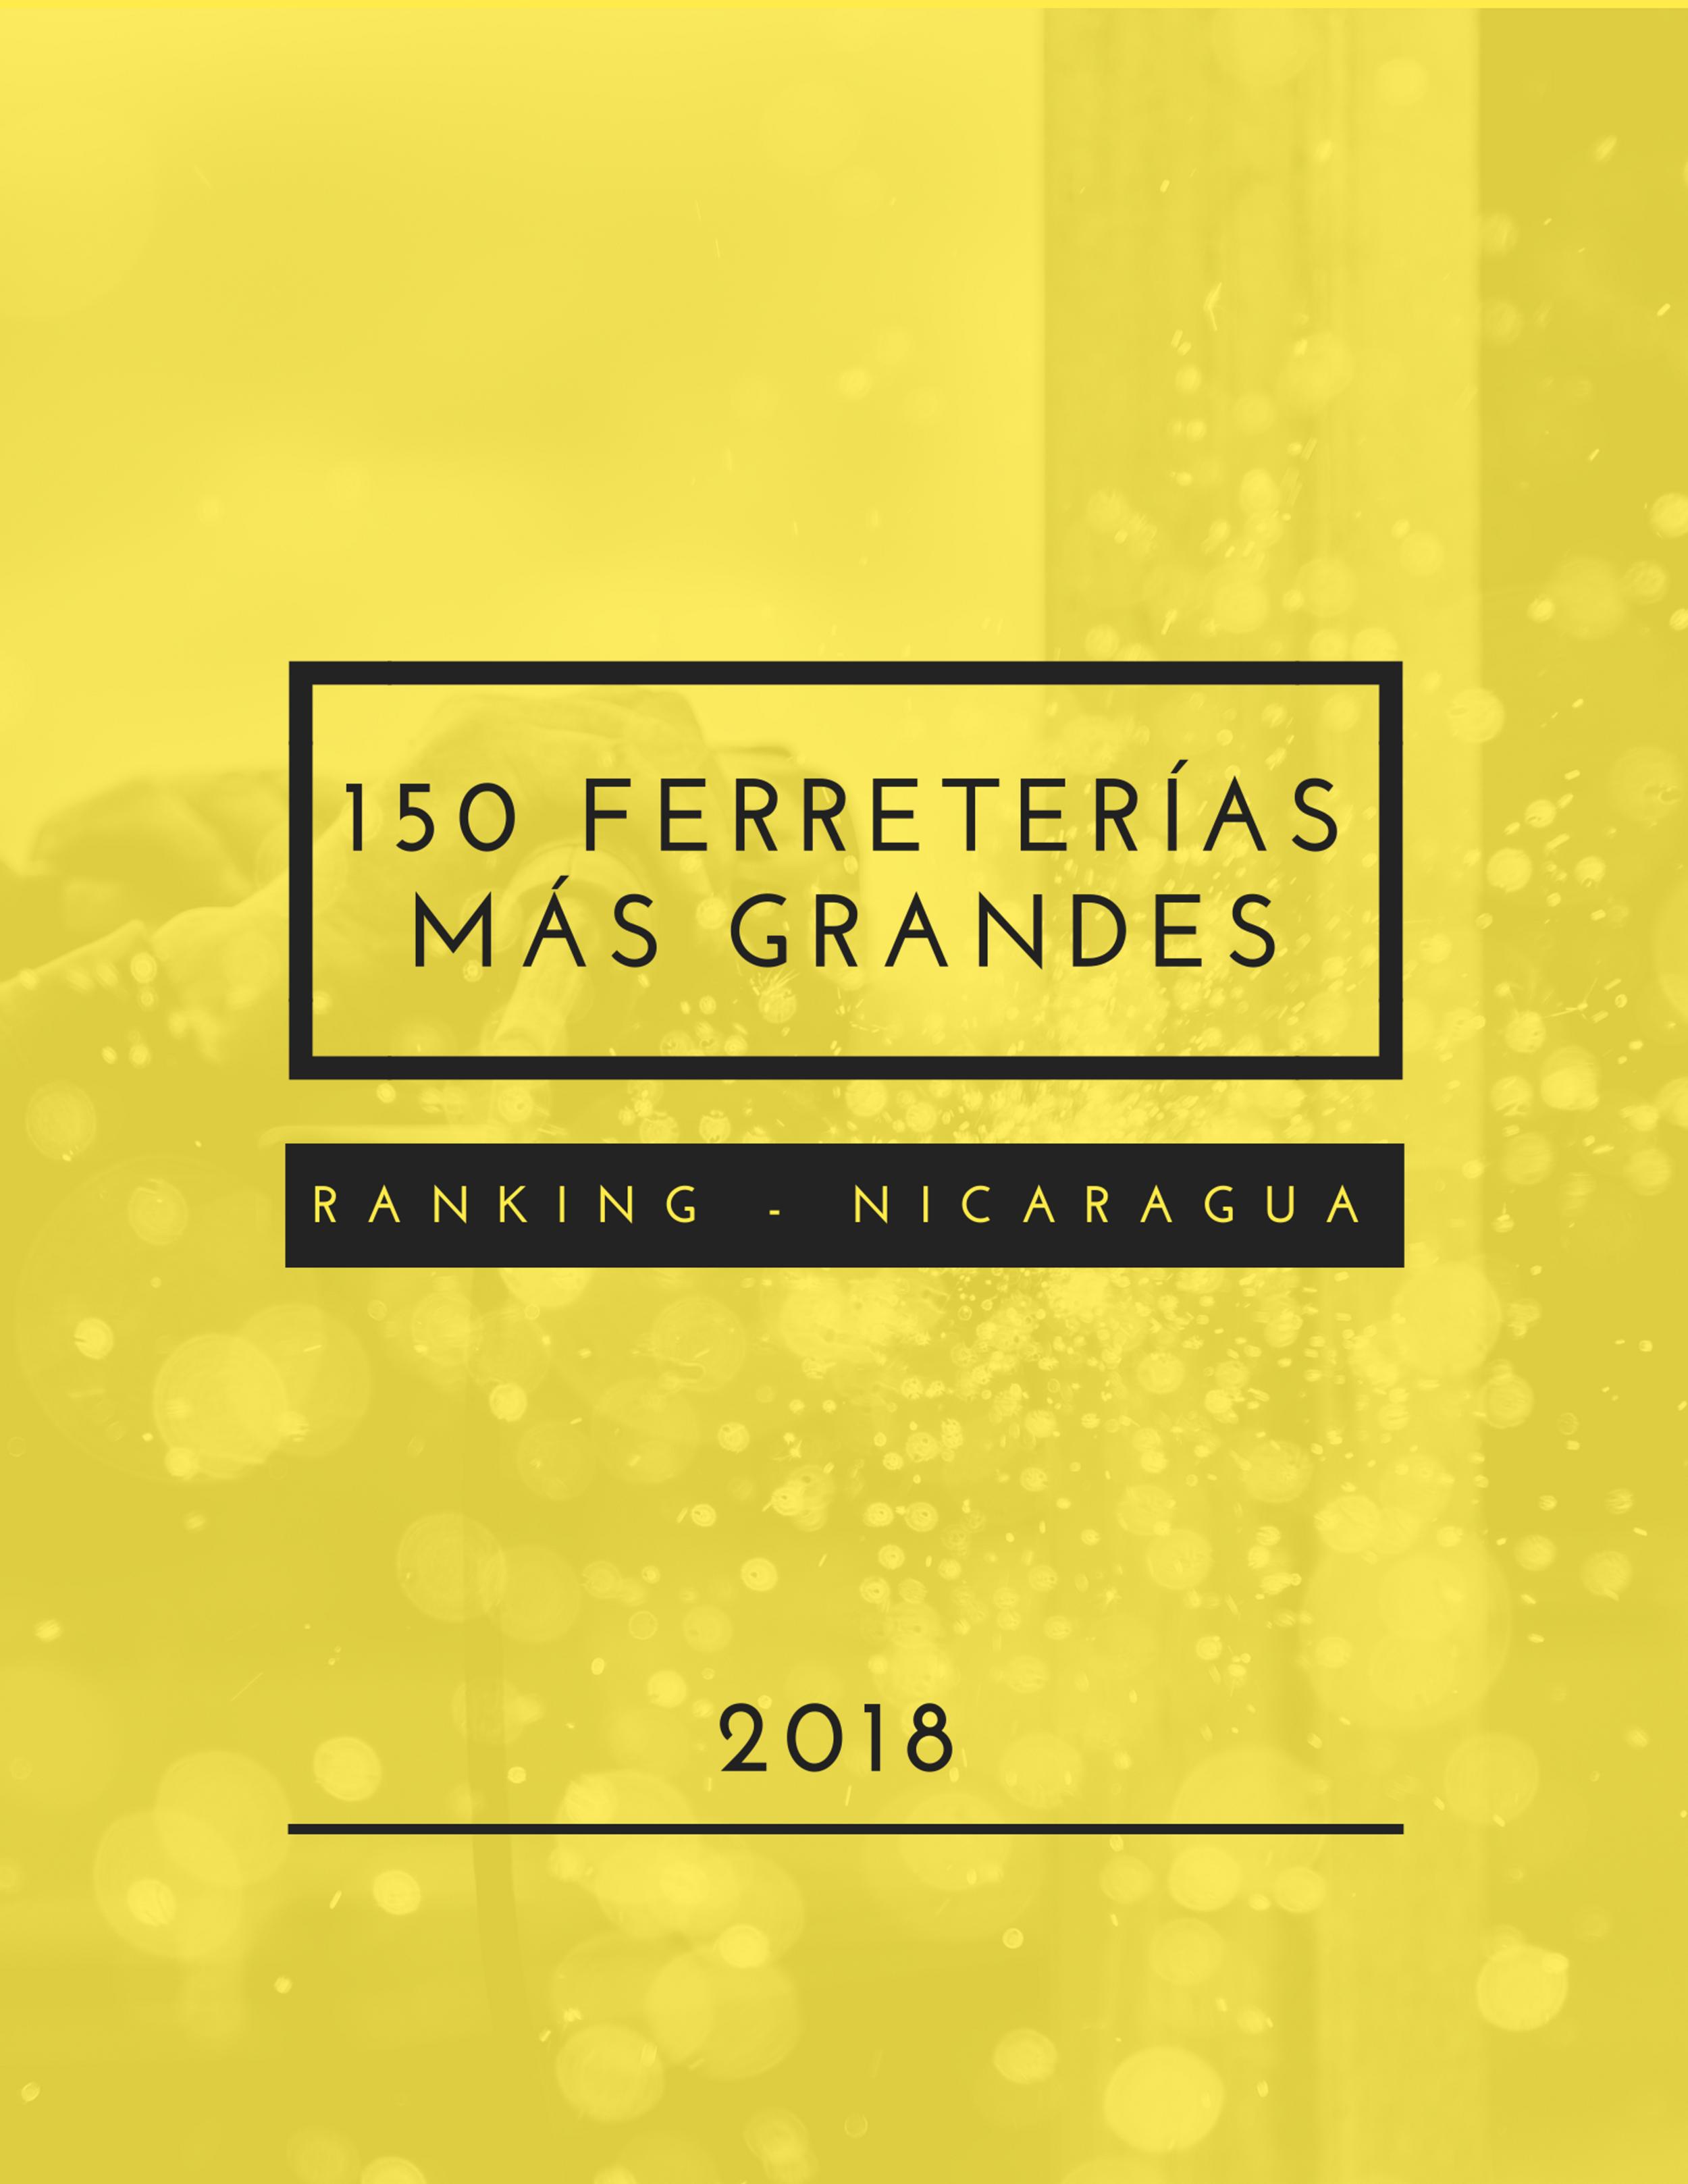 Ranking Nicaragua.png